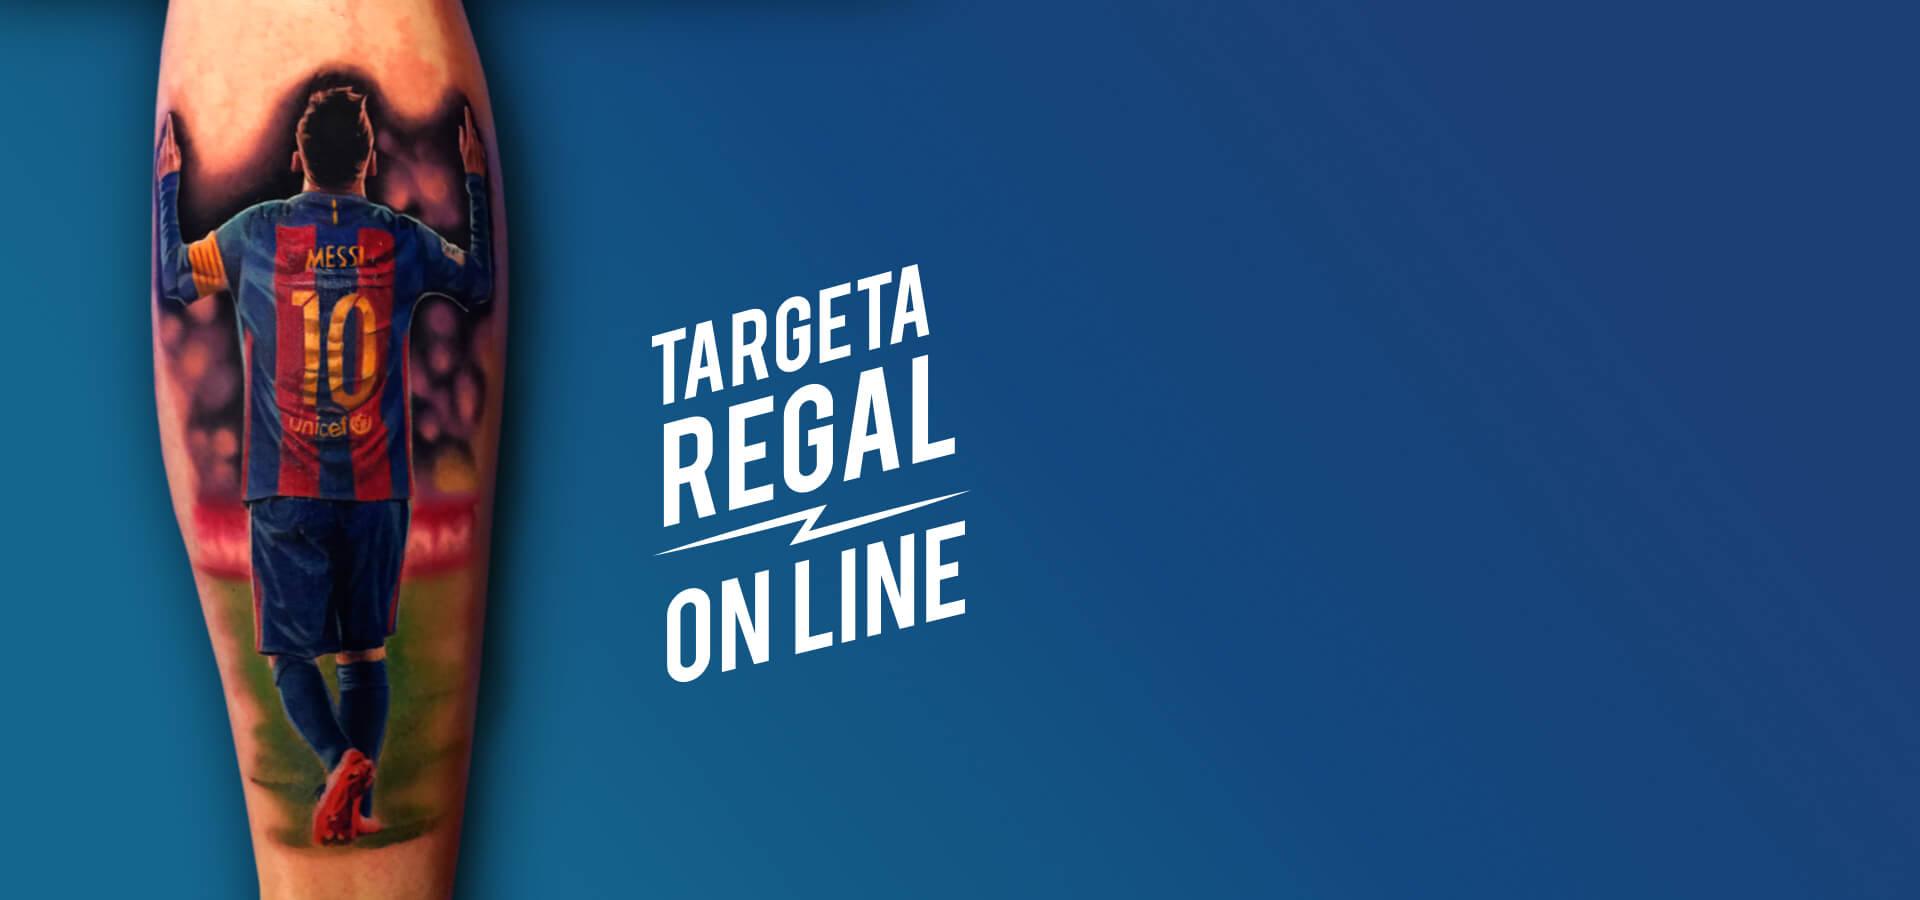 Targeta regal online tatuatges